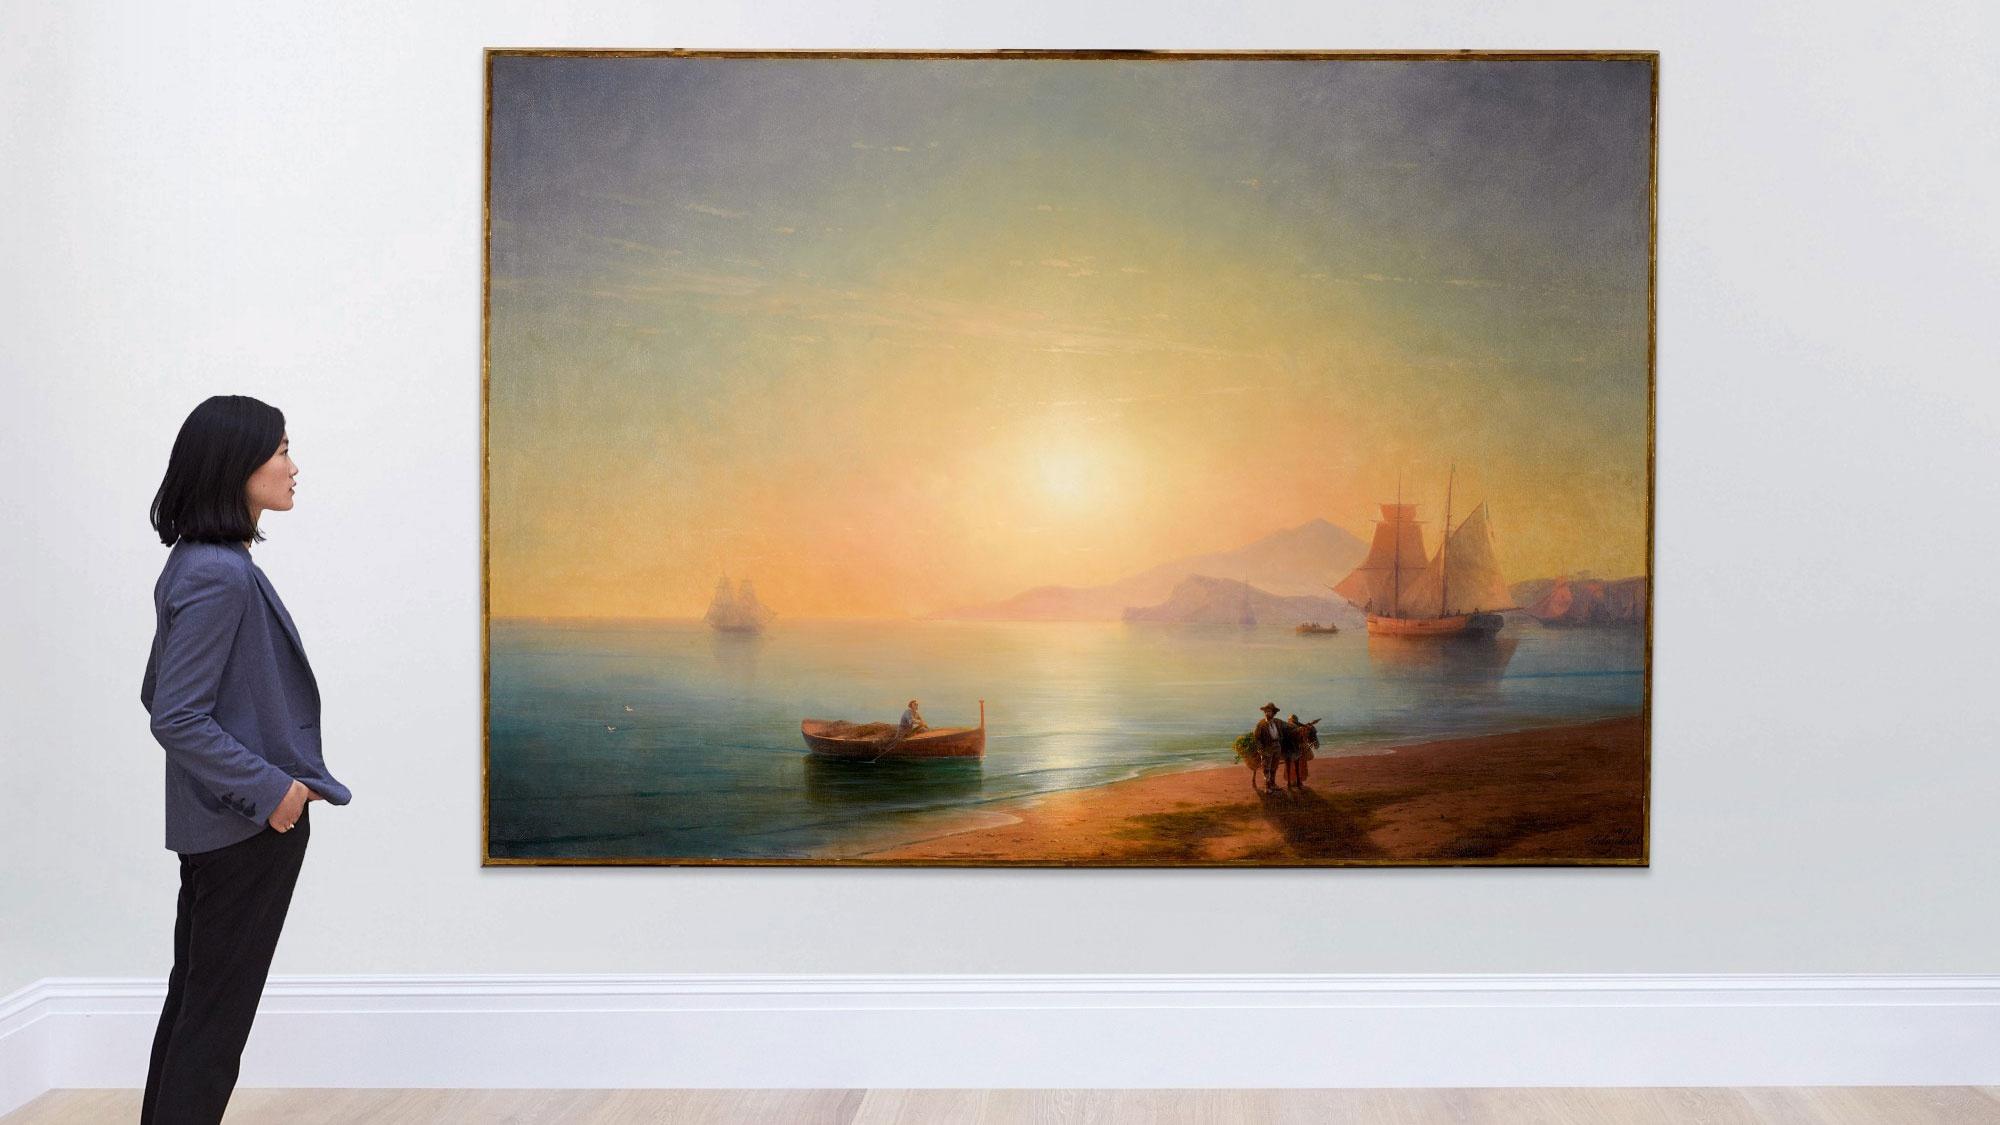 Картину Айвазовского продали на онлайн-аукционе в Лондоне почти за три миллиона долларов